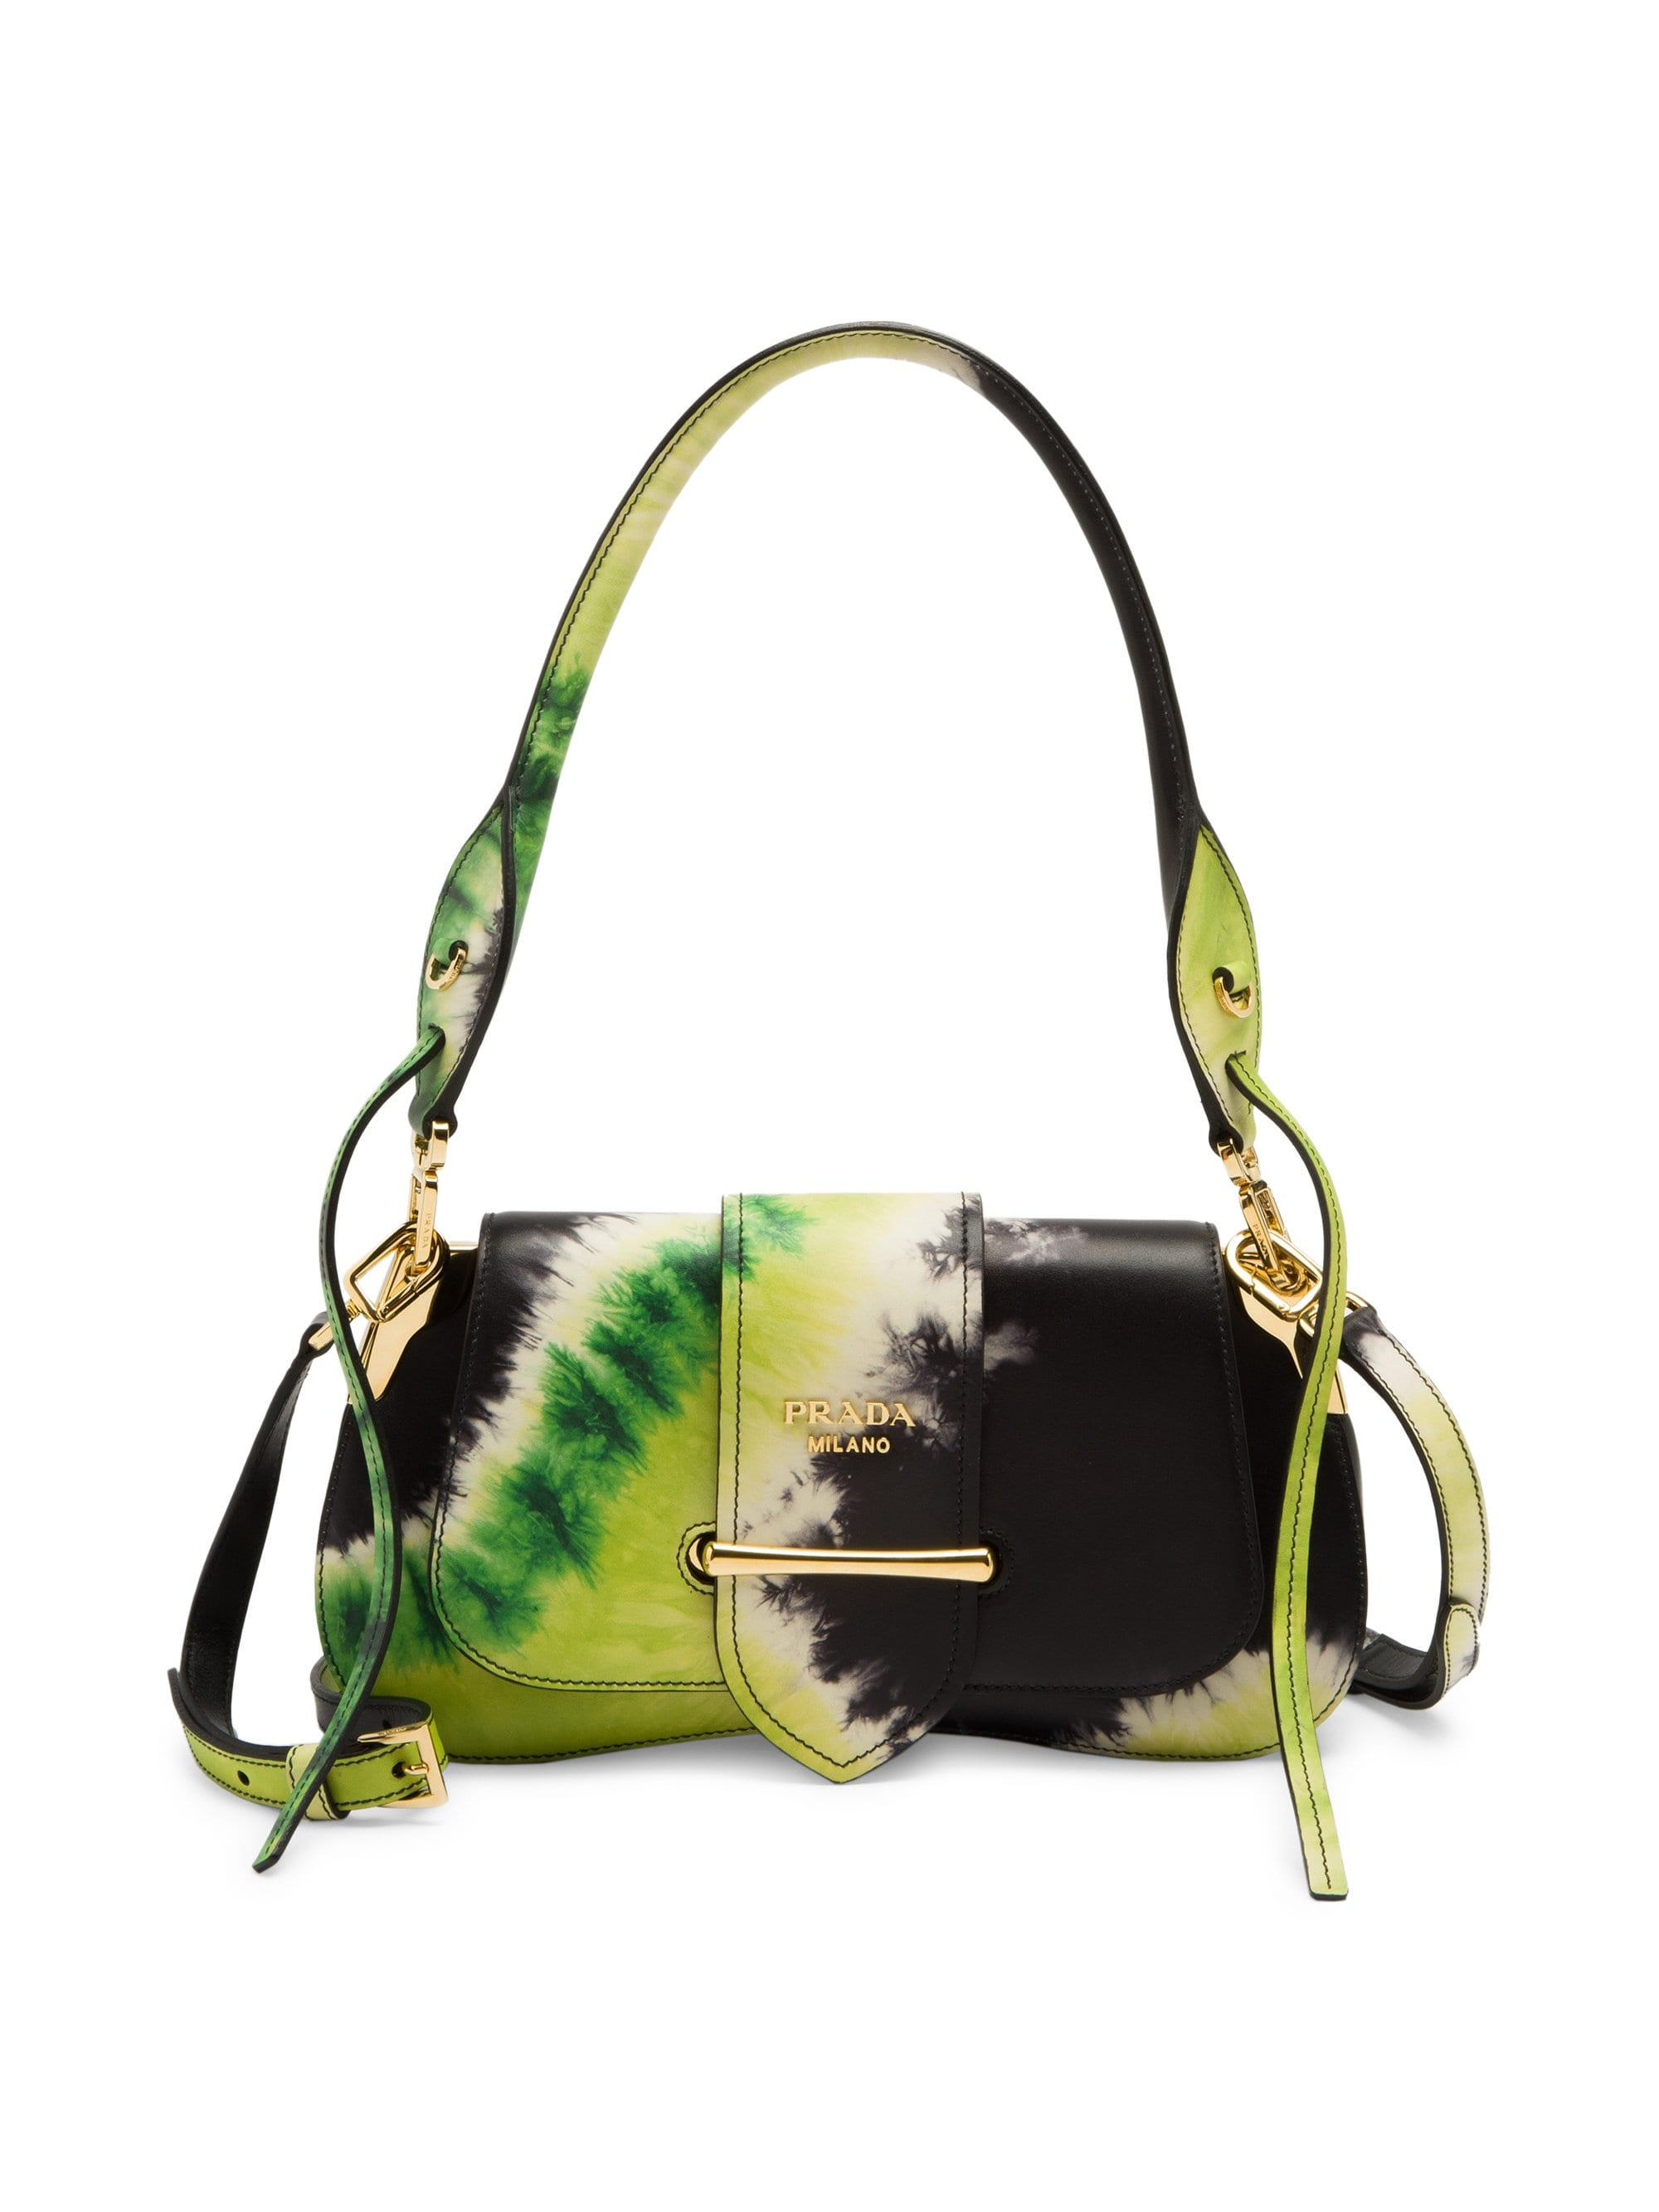 64a256d907 Prada Women's Sidonie Tie Dye Shoulder Bag - Nero Lime in Black - Lyst